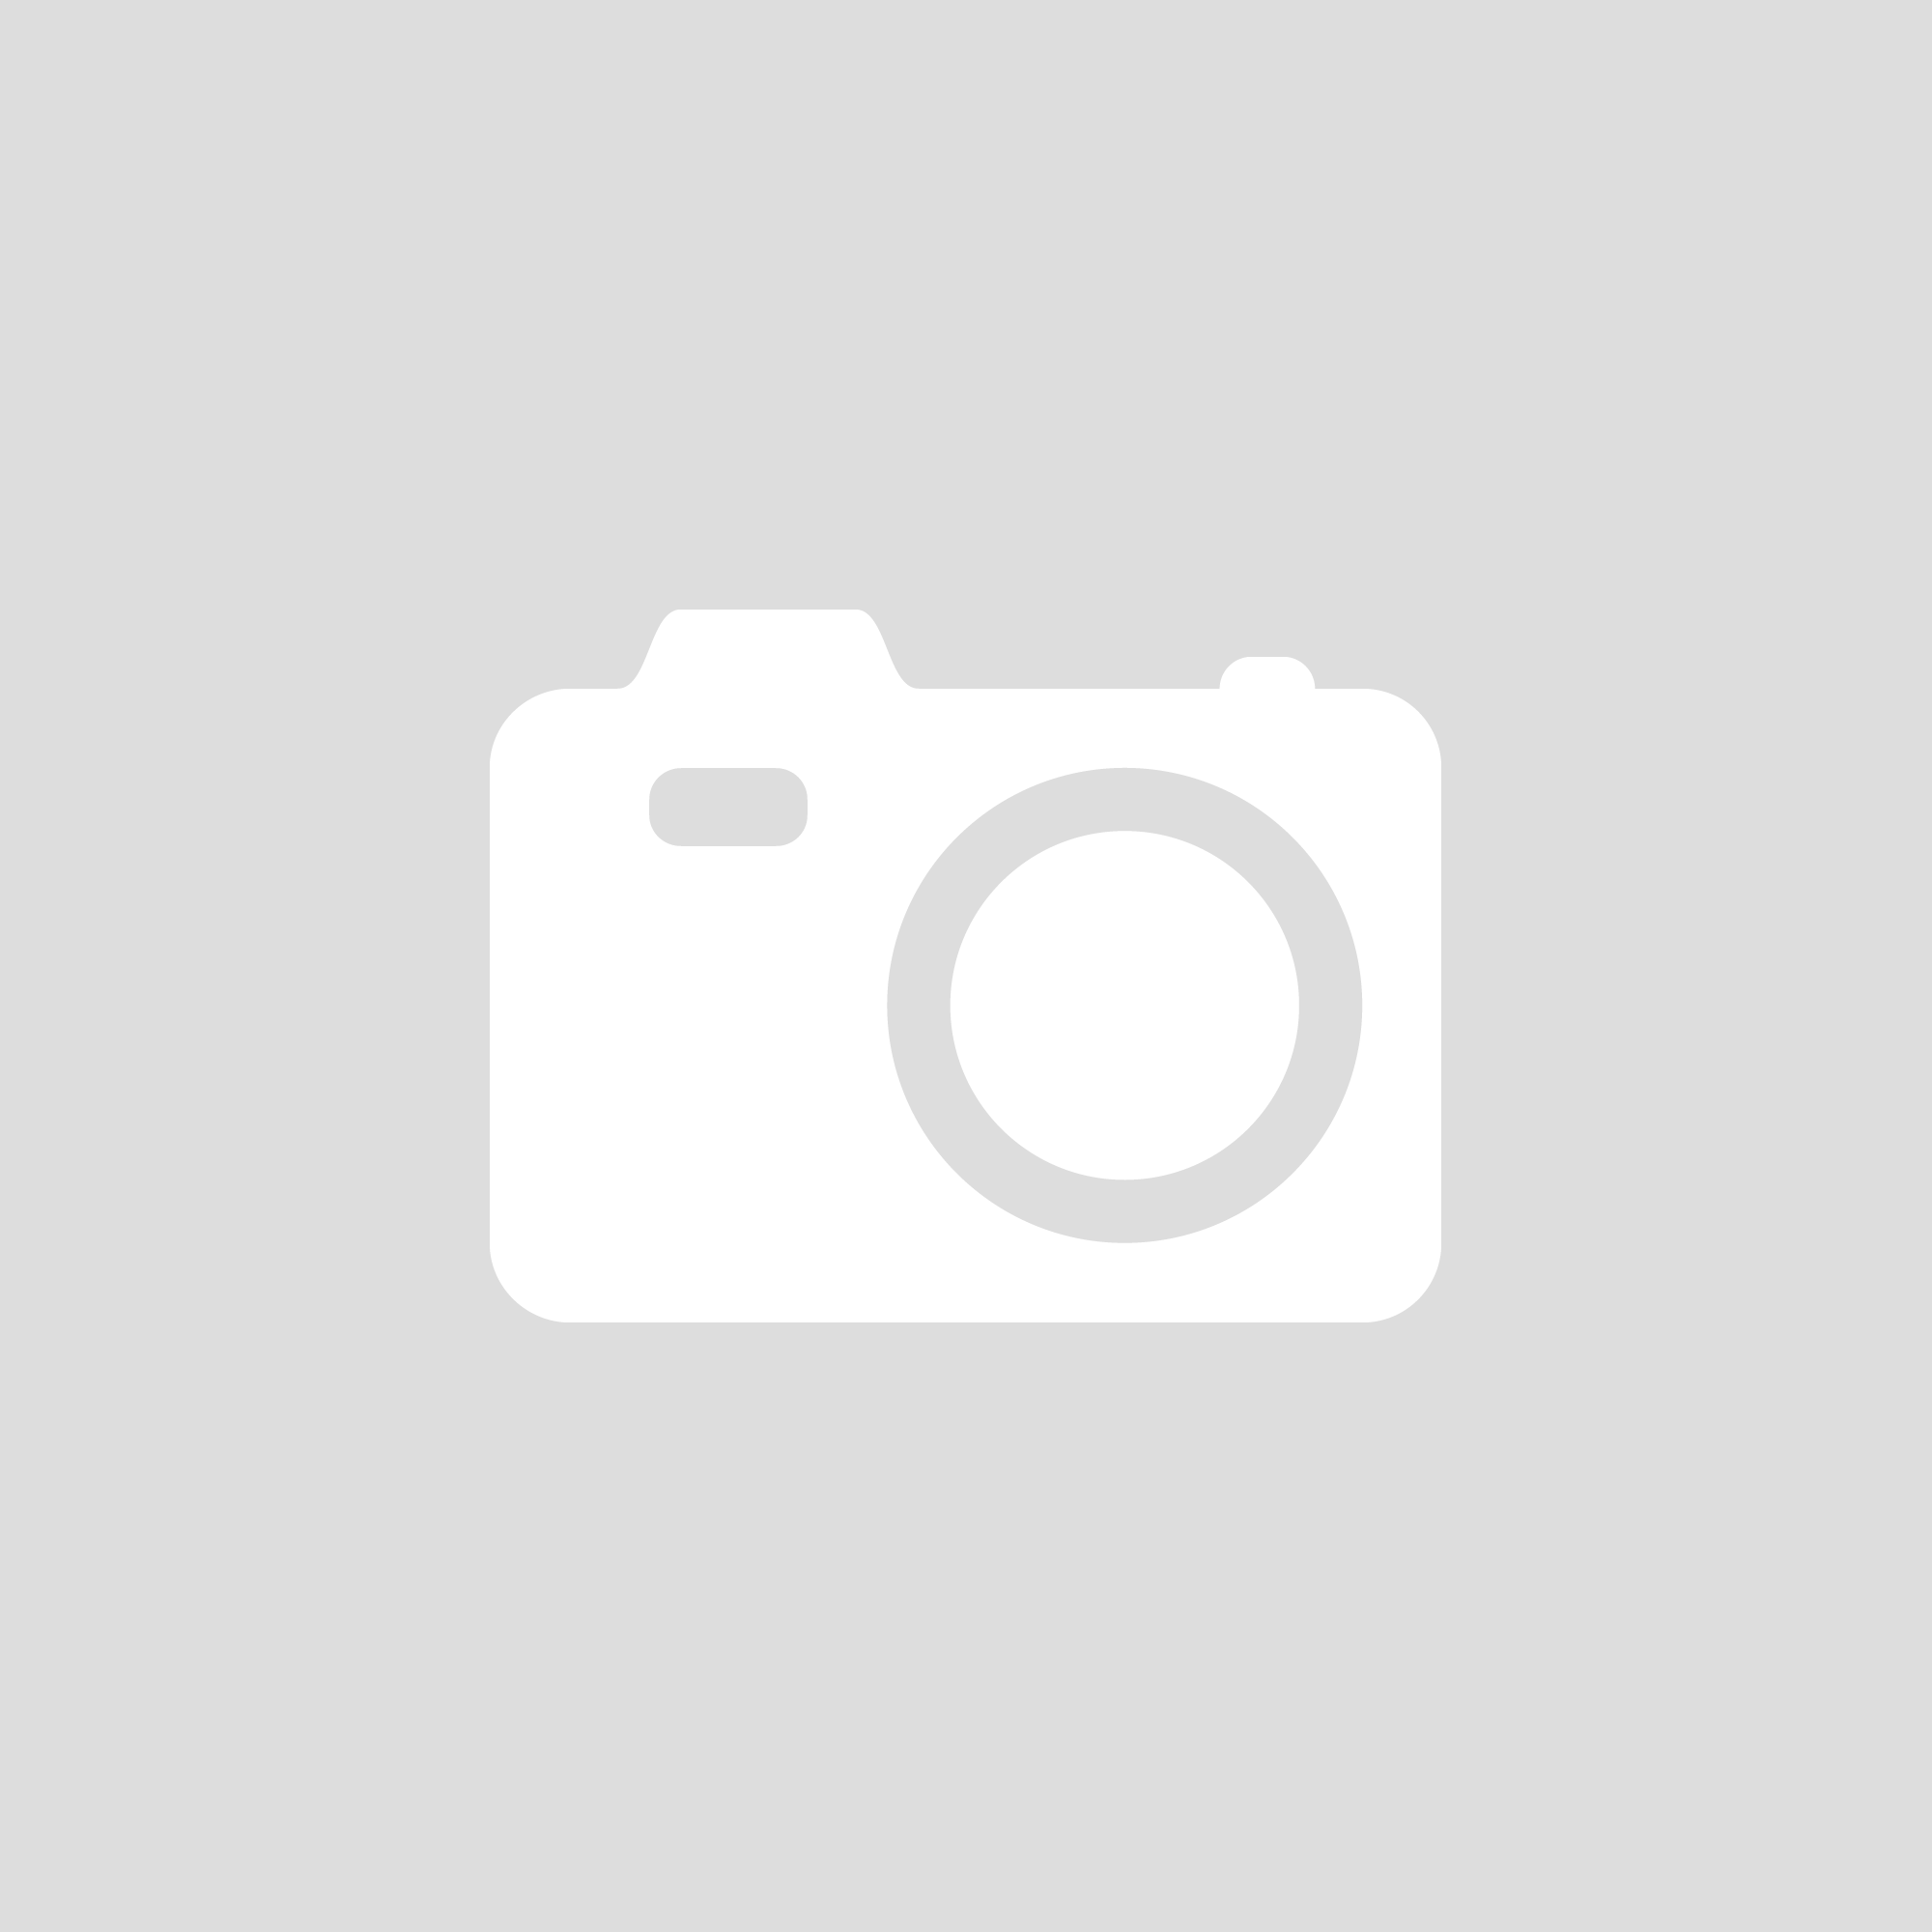 Diamond Single Tealight Holder With Black Sparkling Base From CIMC